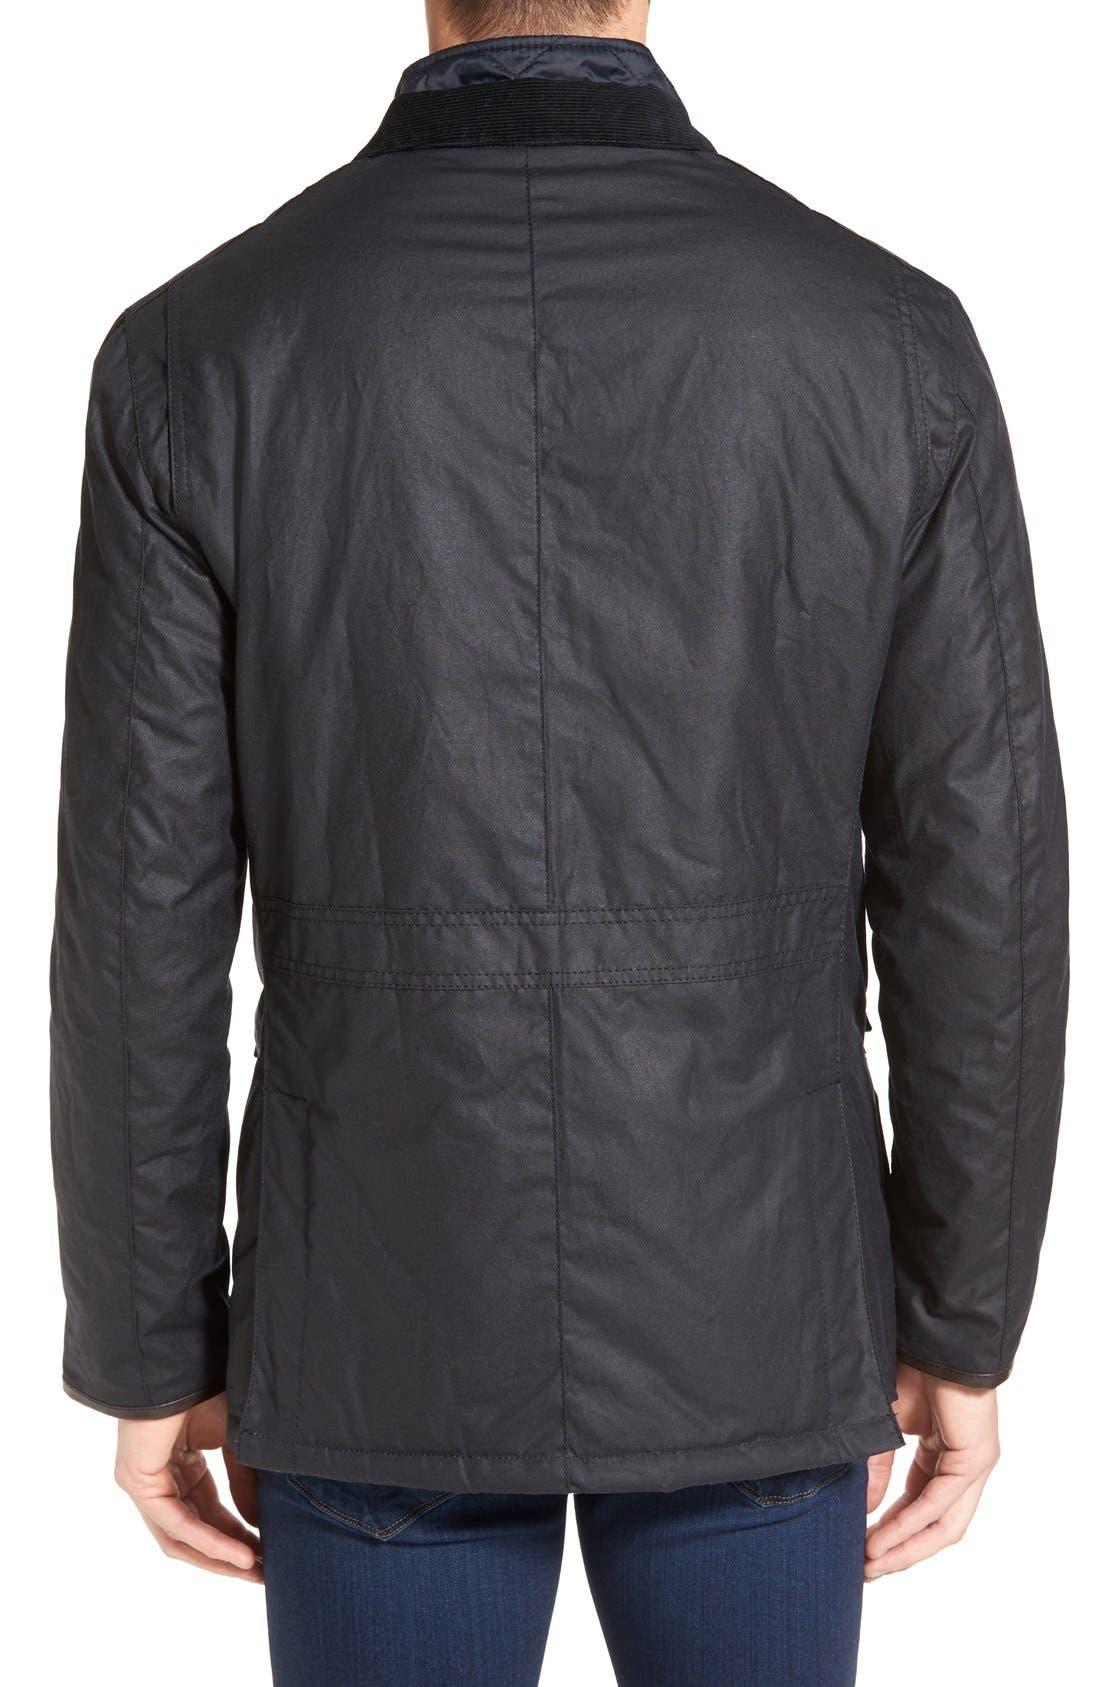 Torridon Wax Jacket with Bib,                             Alternate thumbnail 3, color,                             410